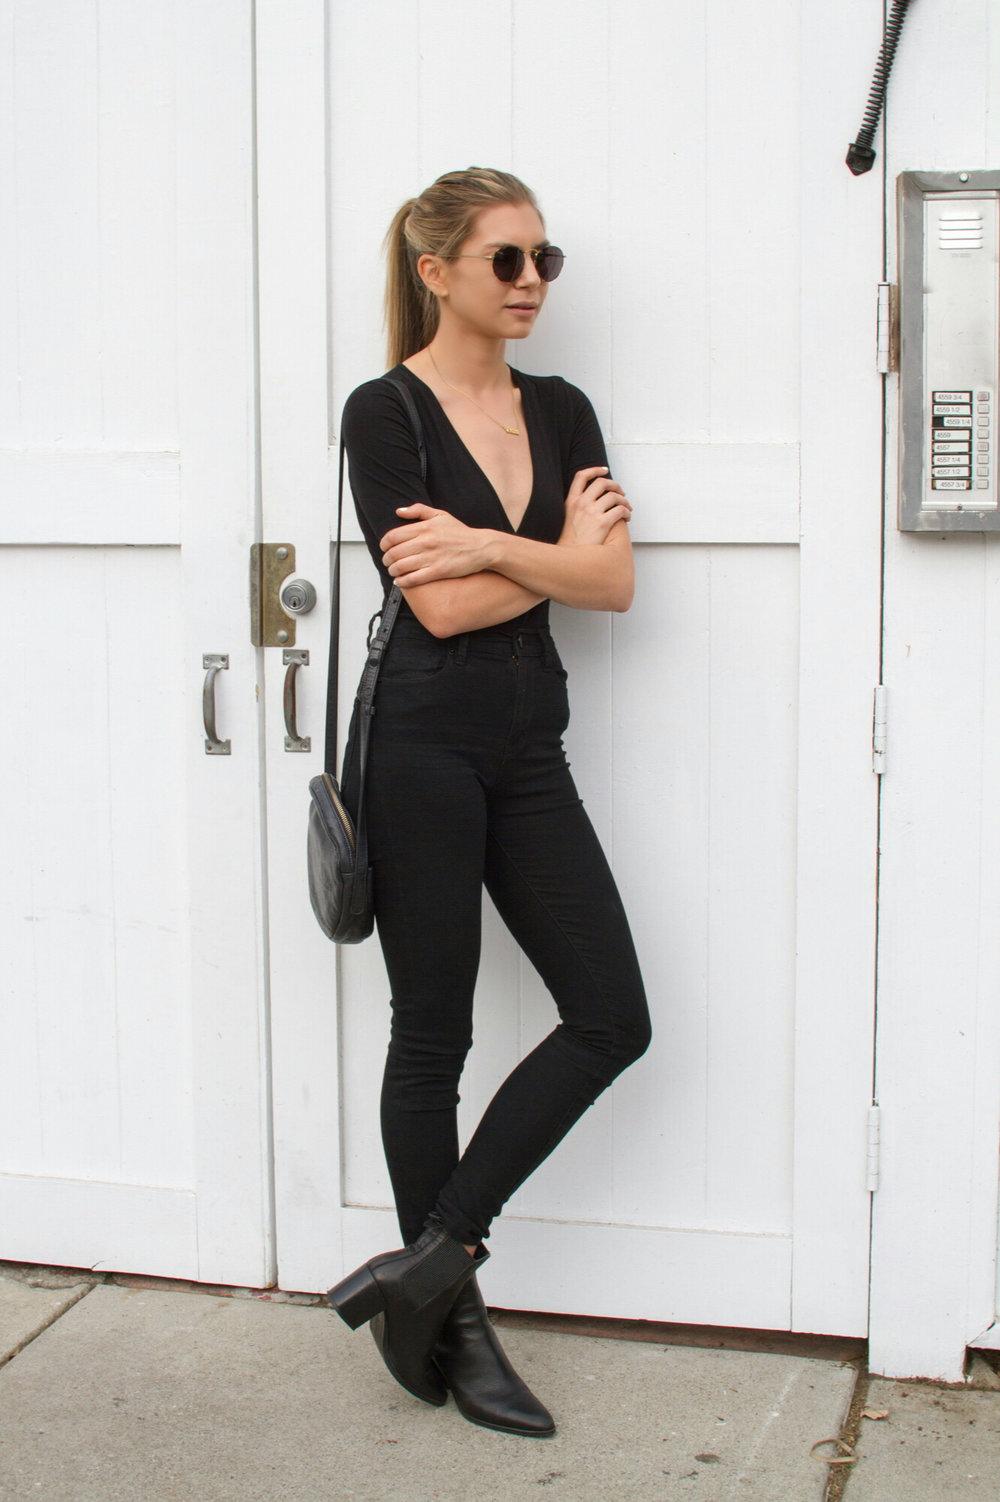 Pajama Style Jacket, Zara  ;  Boots, Zara  ;  Jeans, Topshop  ;  Bag, Bagg